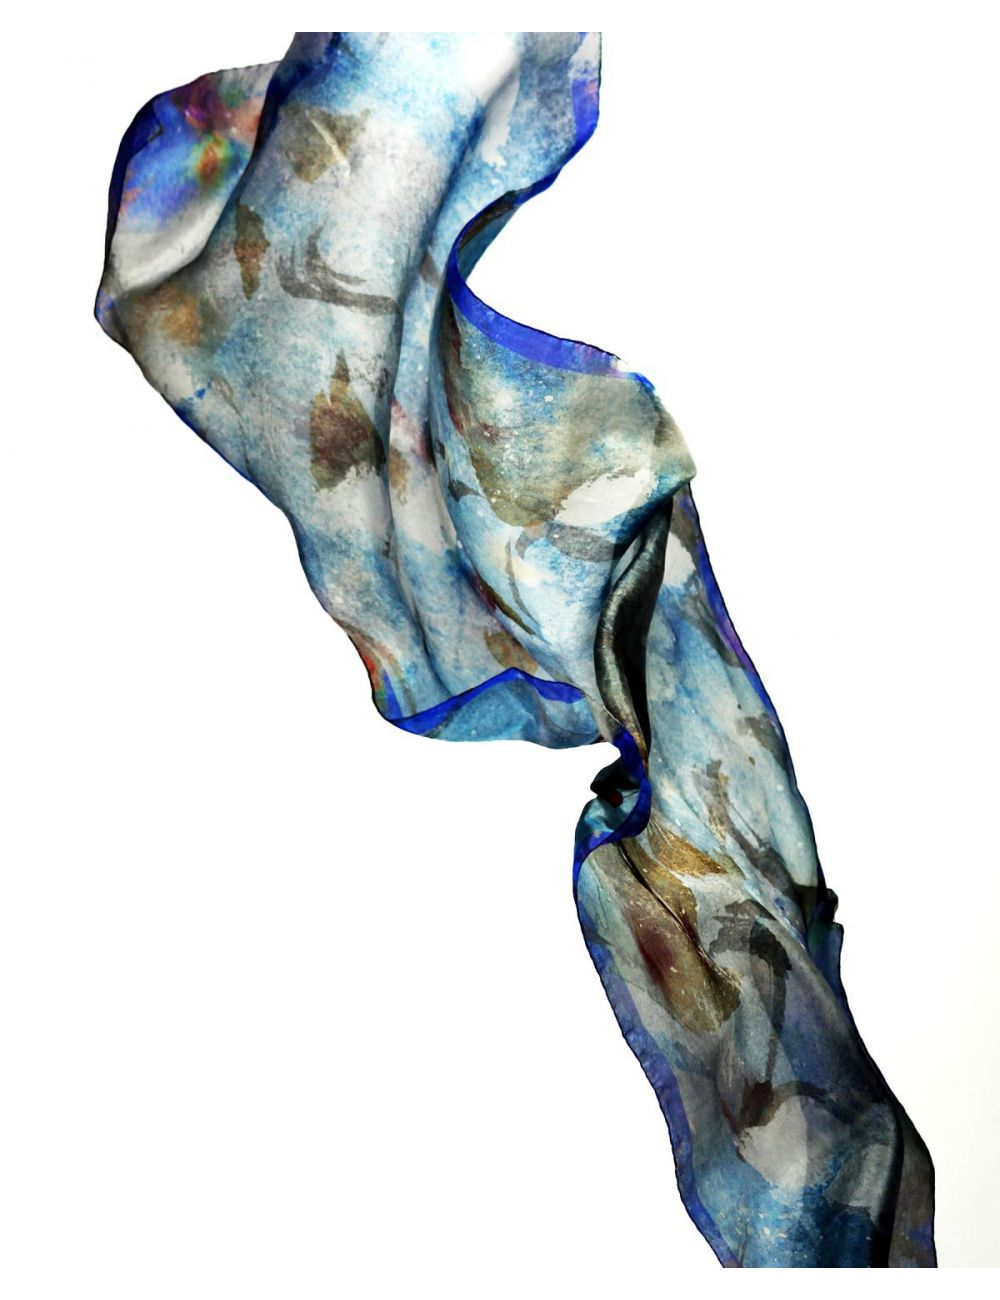 """Rough sea"" silk scarf inspired by a stormy blue sea."